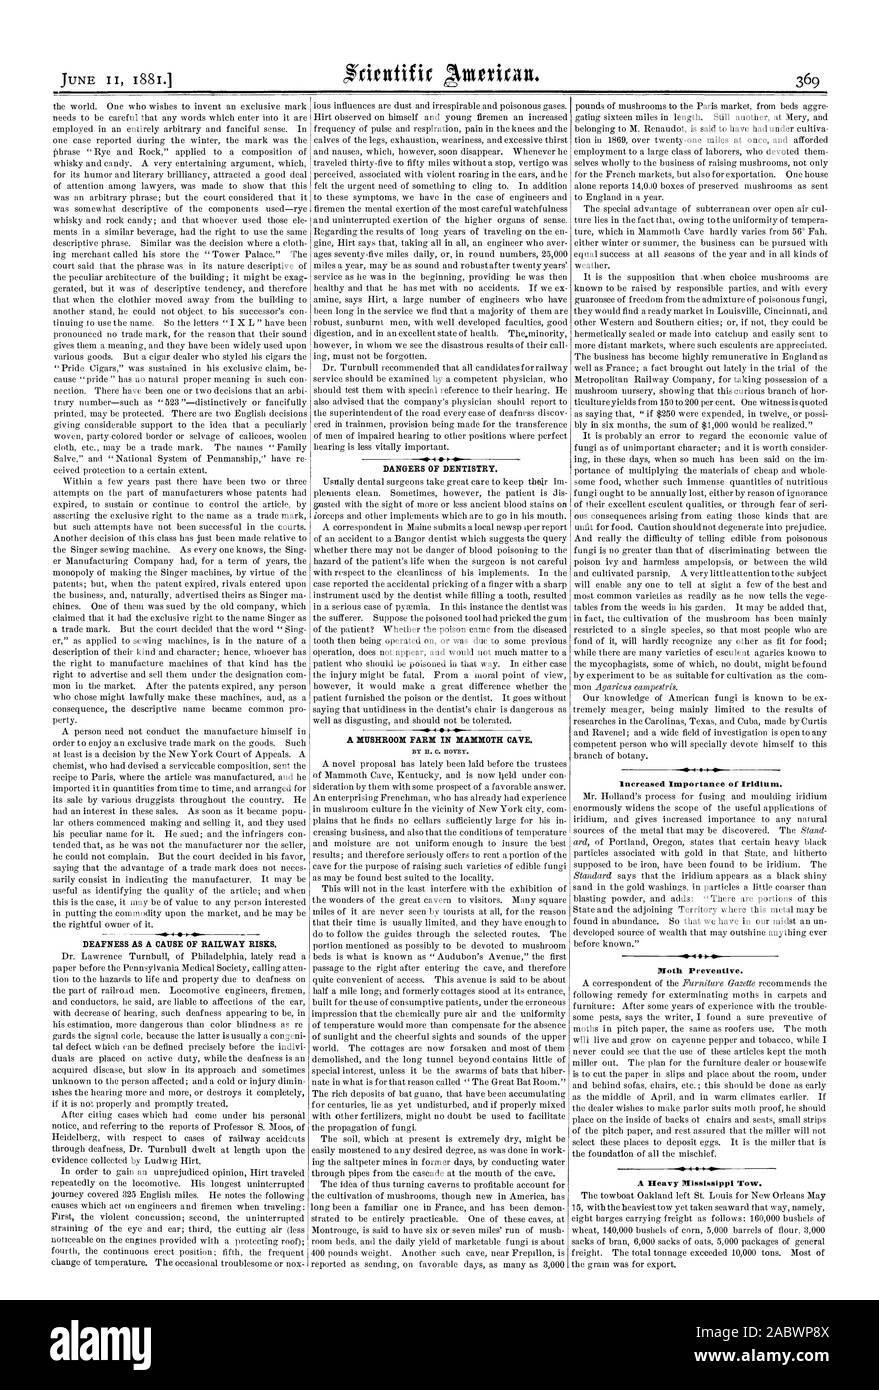 Increased Importance of Iridium. Moth Preventive. A Heavy Mississippi Tow., scientific american, 1881-06-11 Stock Photo